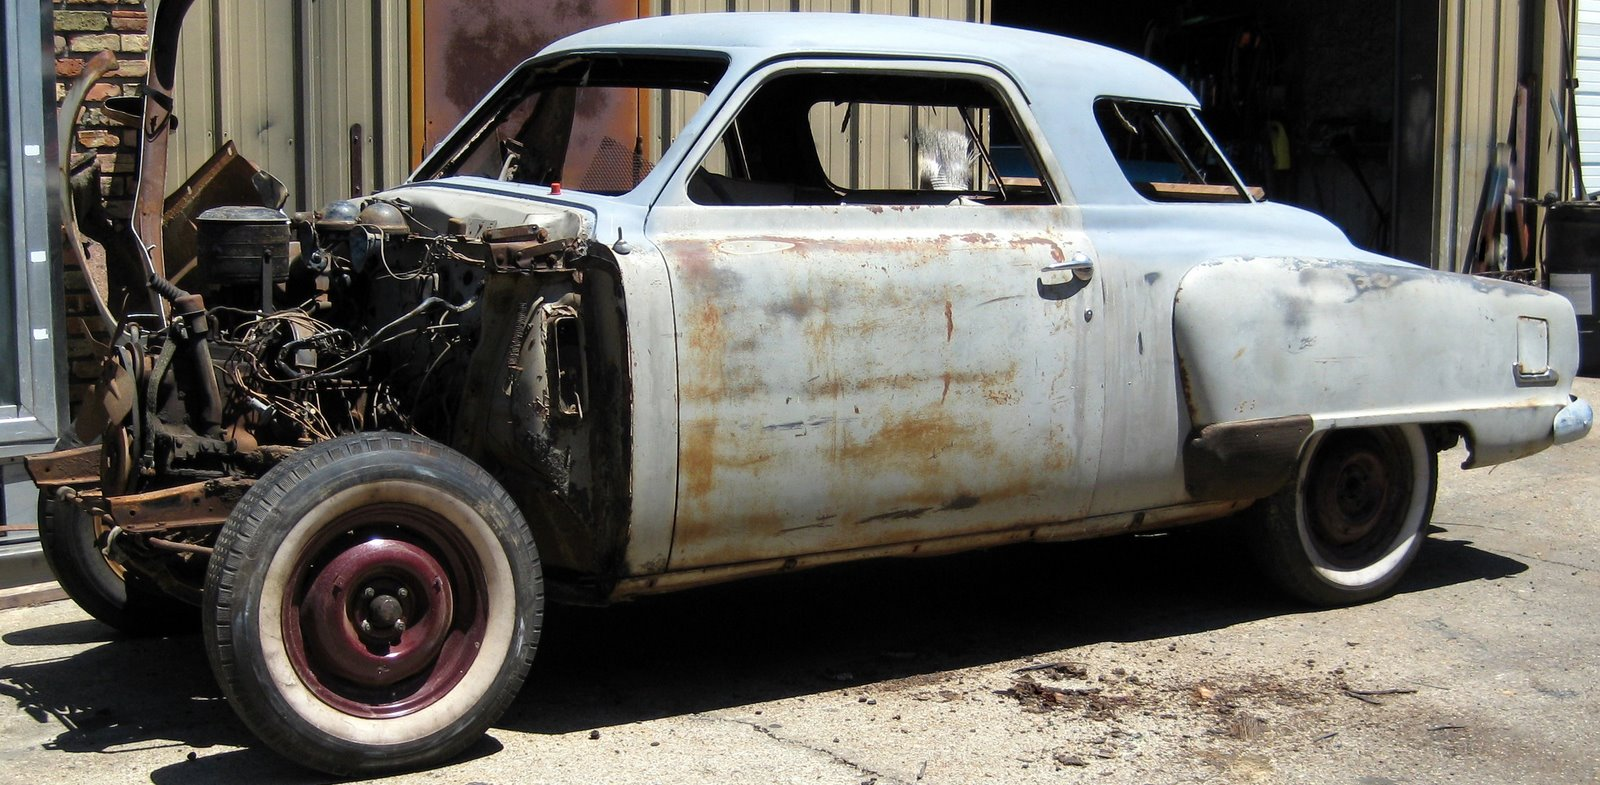 Studebaker, Hudson, Street Rods, And More: 2014 FOR SALE LIST